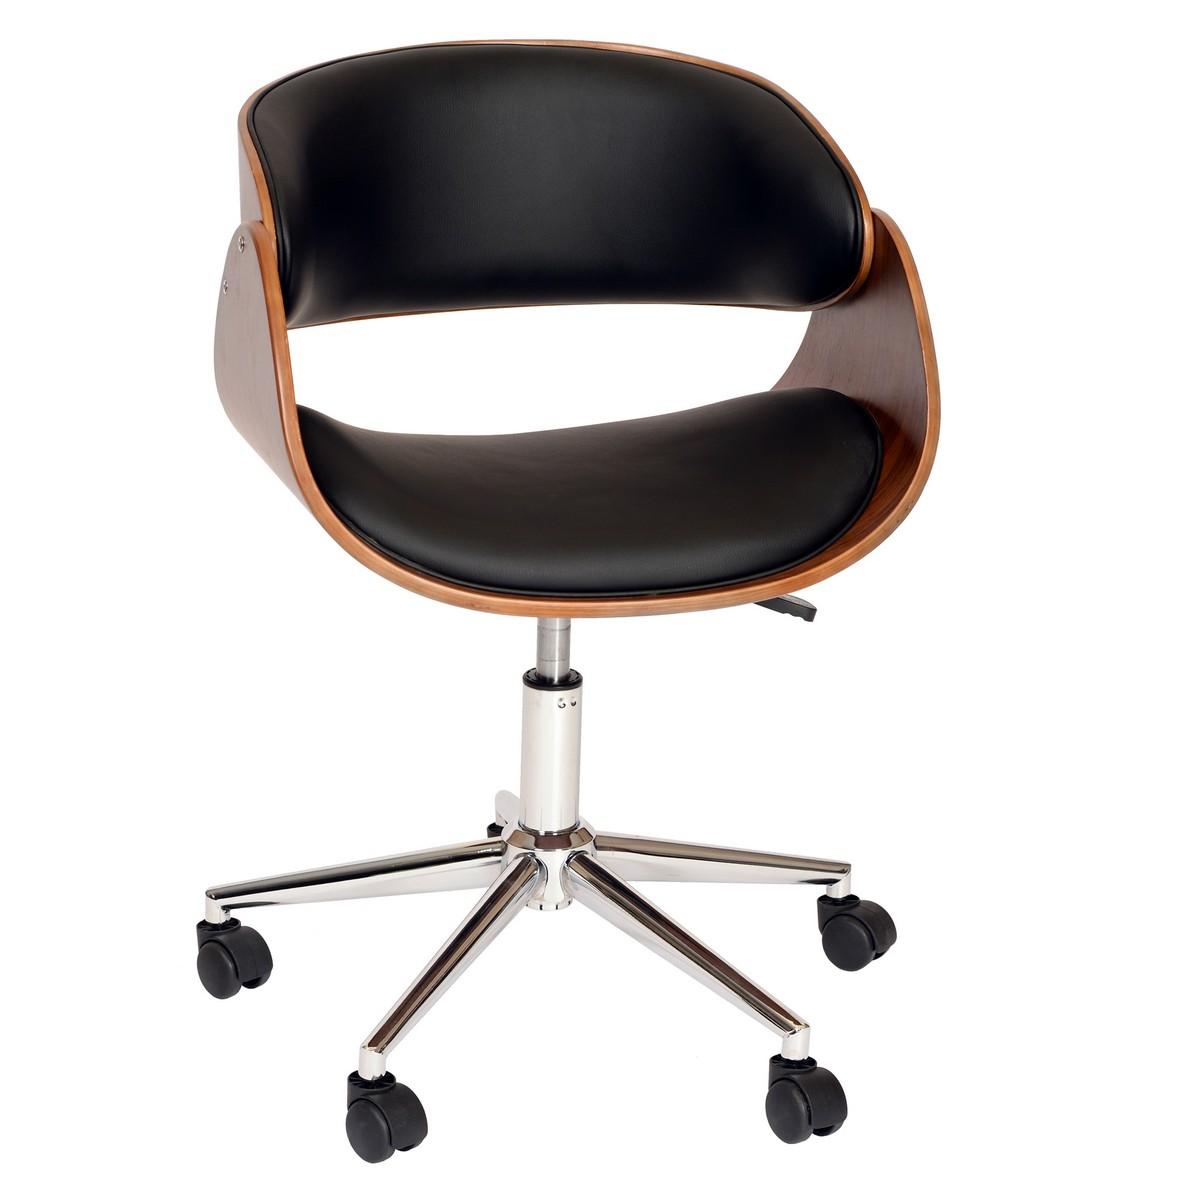 Armen Living Julian Modern Chair In Black And Walnut Veneer Back and Chrome